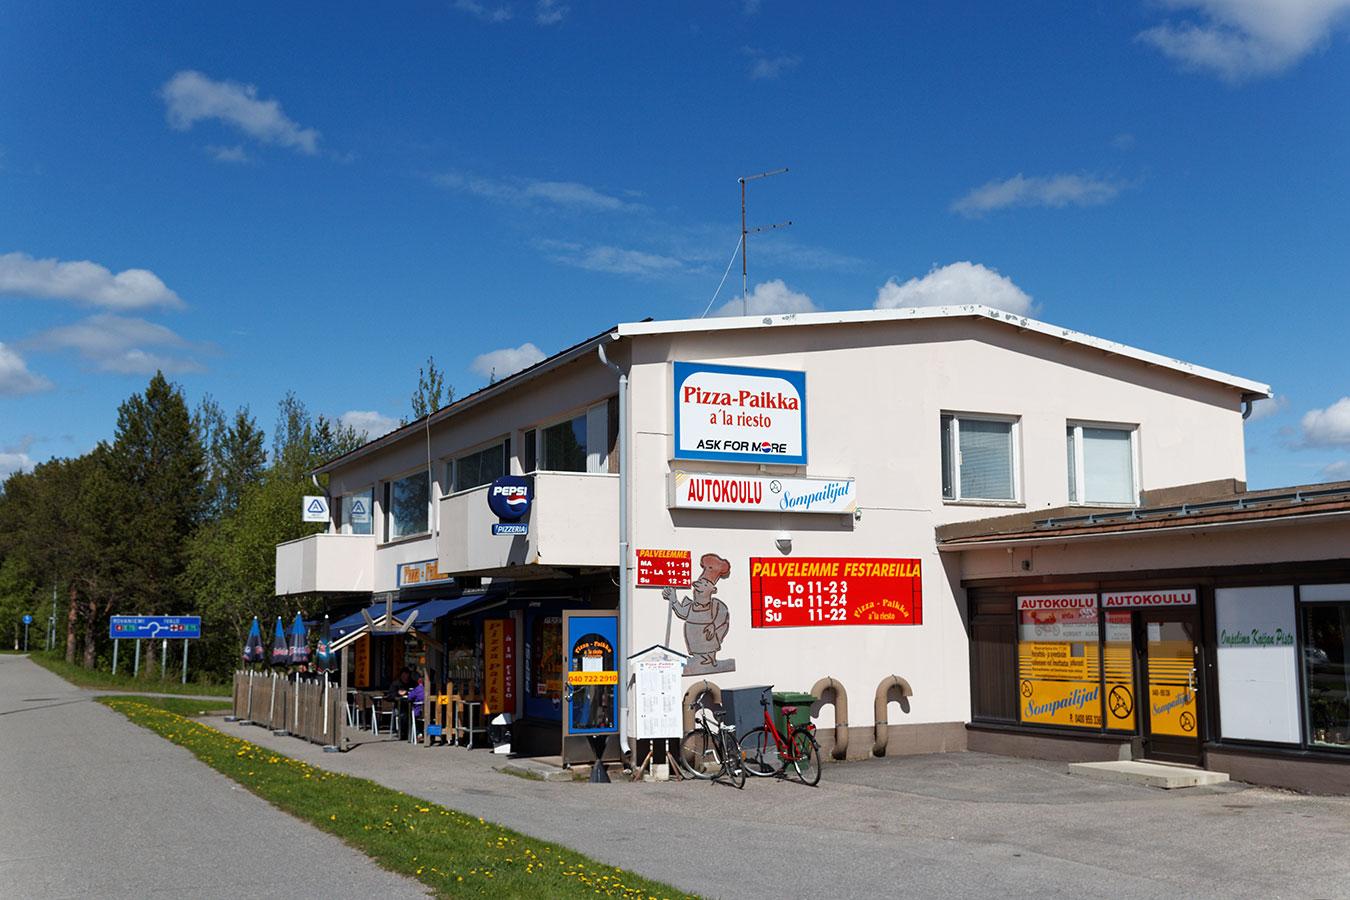 Pizza-Paikka a'la riesto, Sodankylä